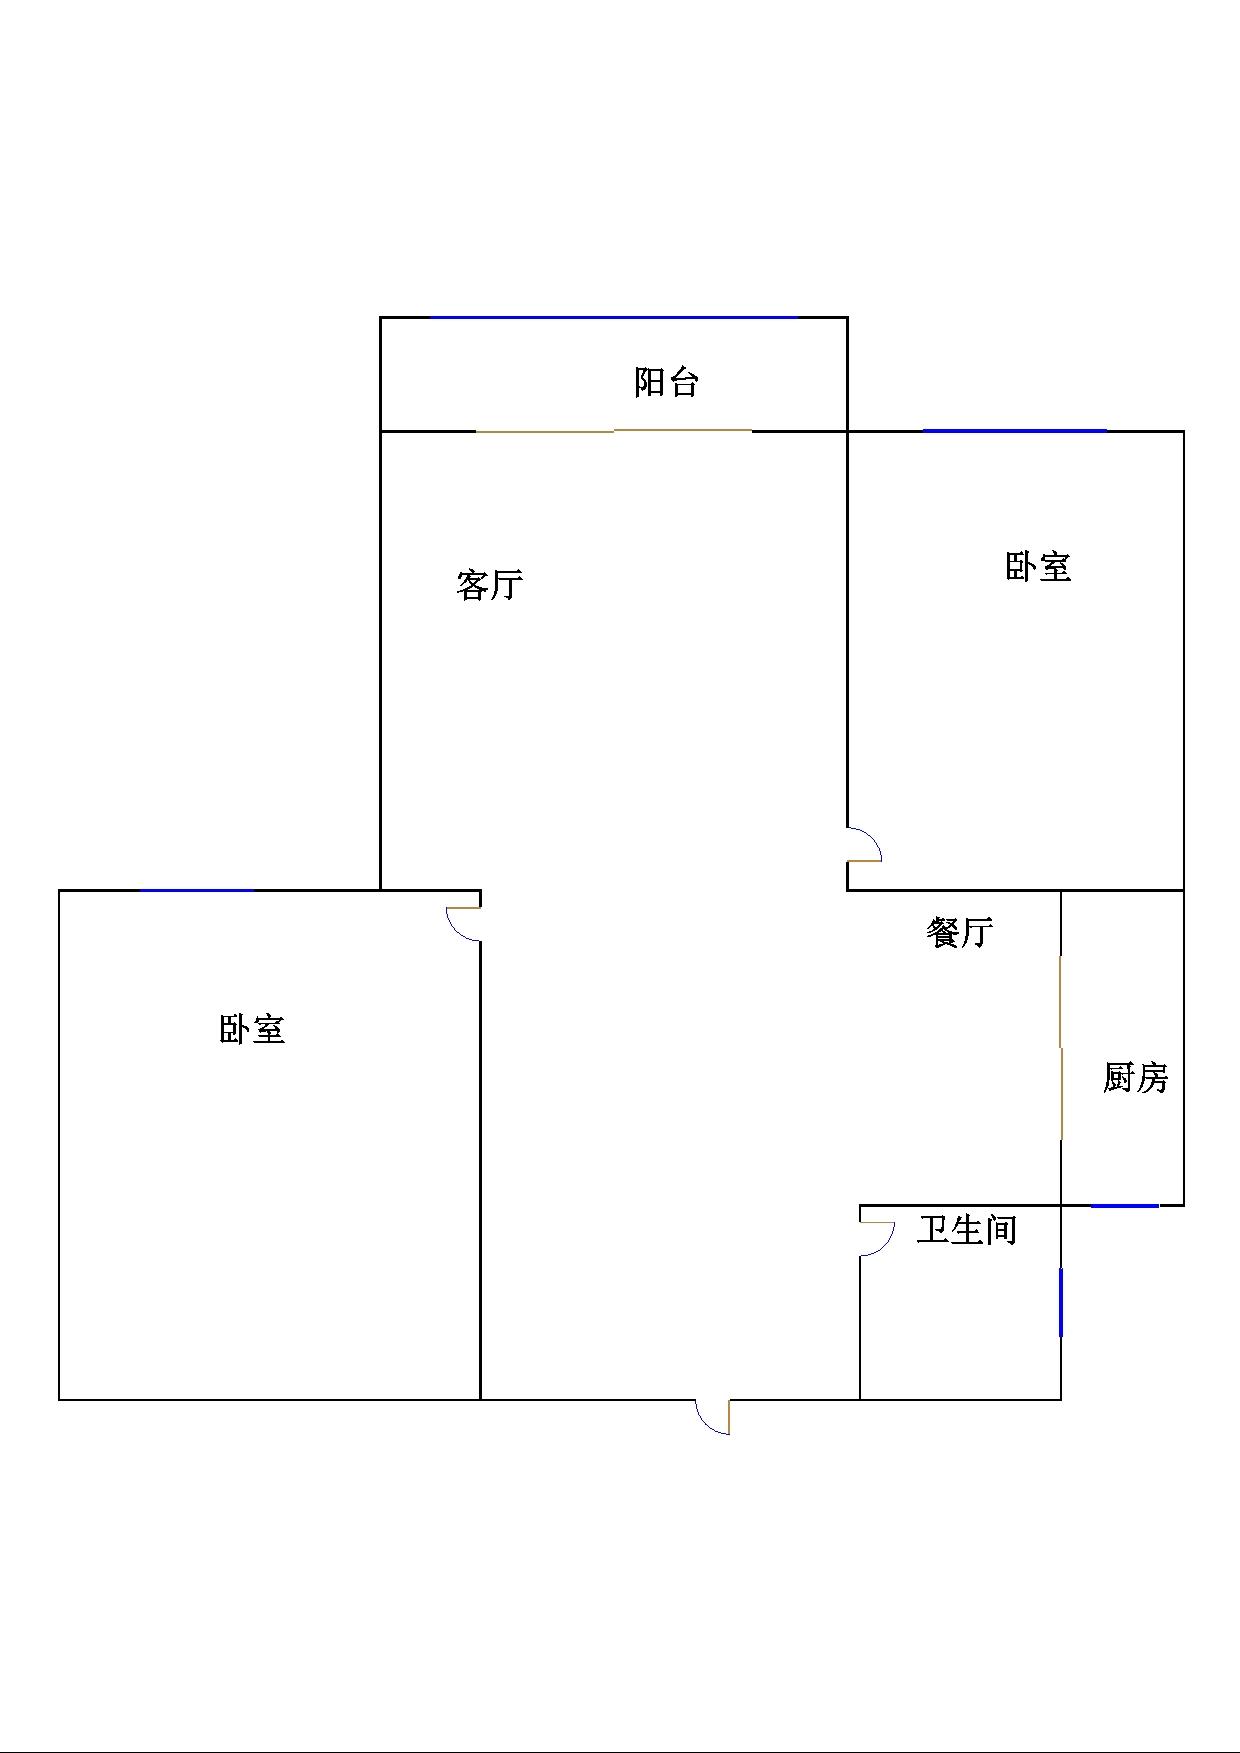 书香苑 2室2厅 12楼